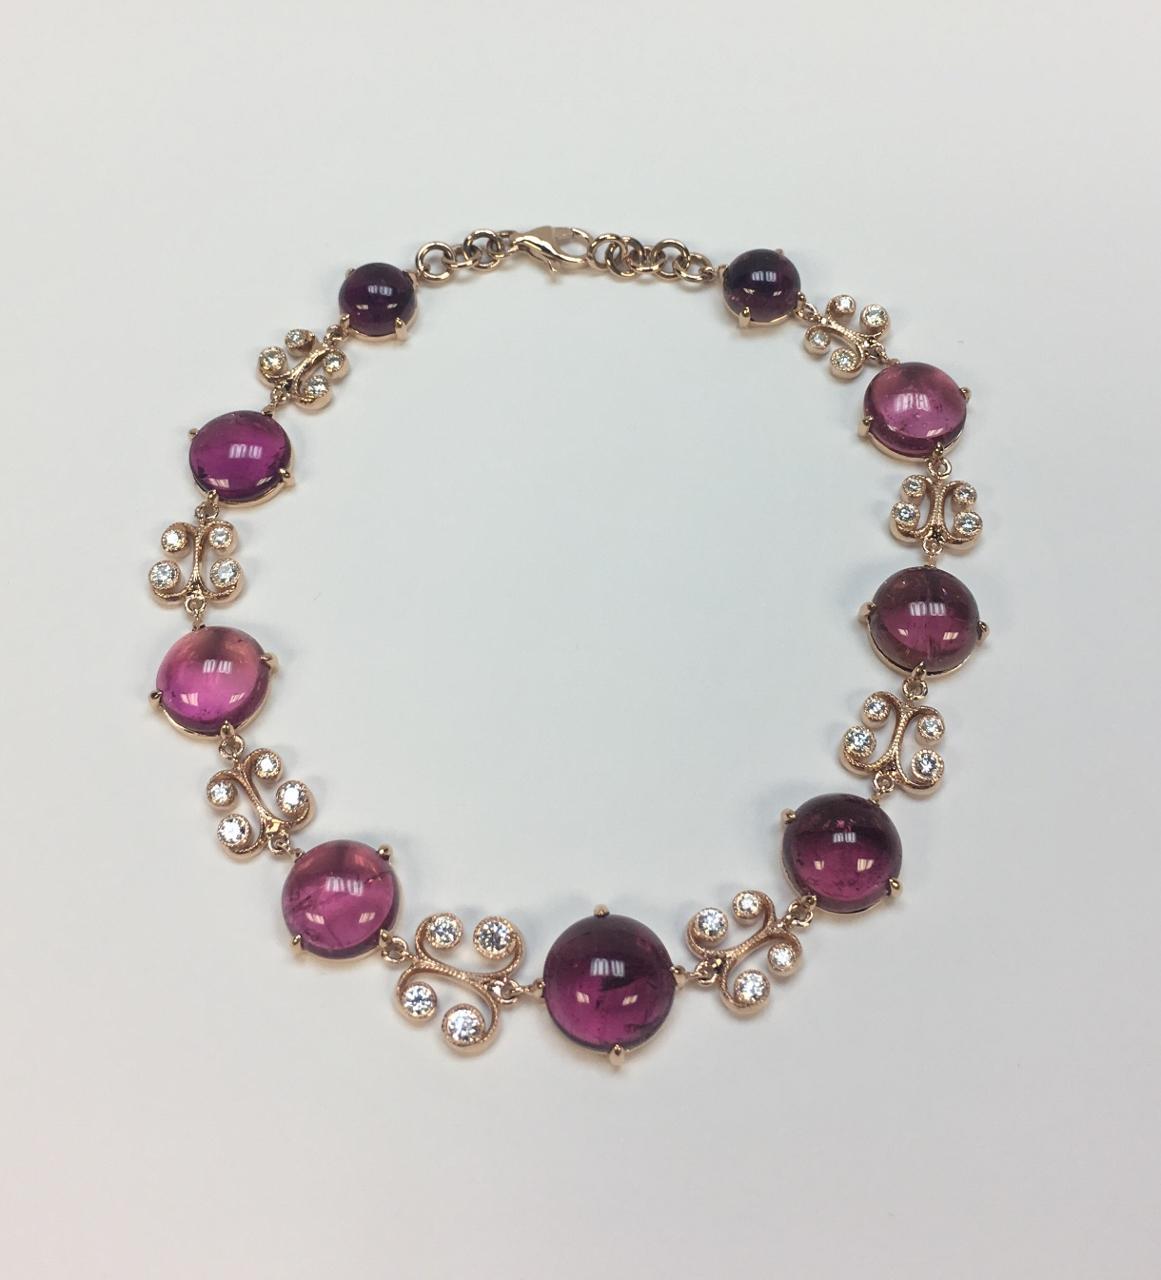 19.40 Carats Pink Tourmaline Rose Gold Bracelet